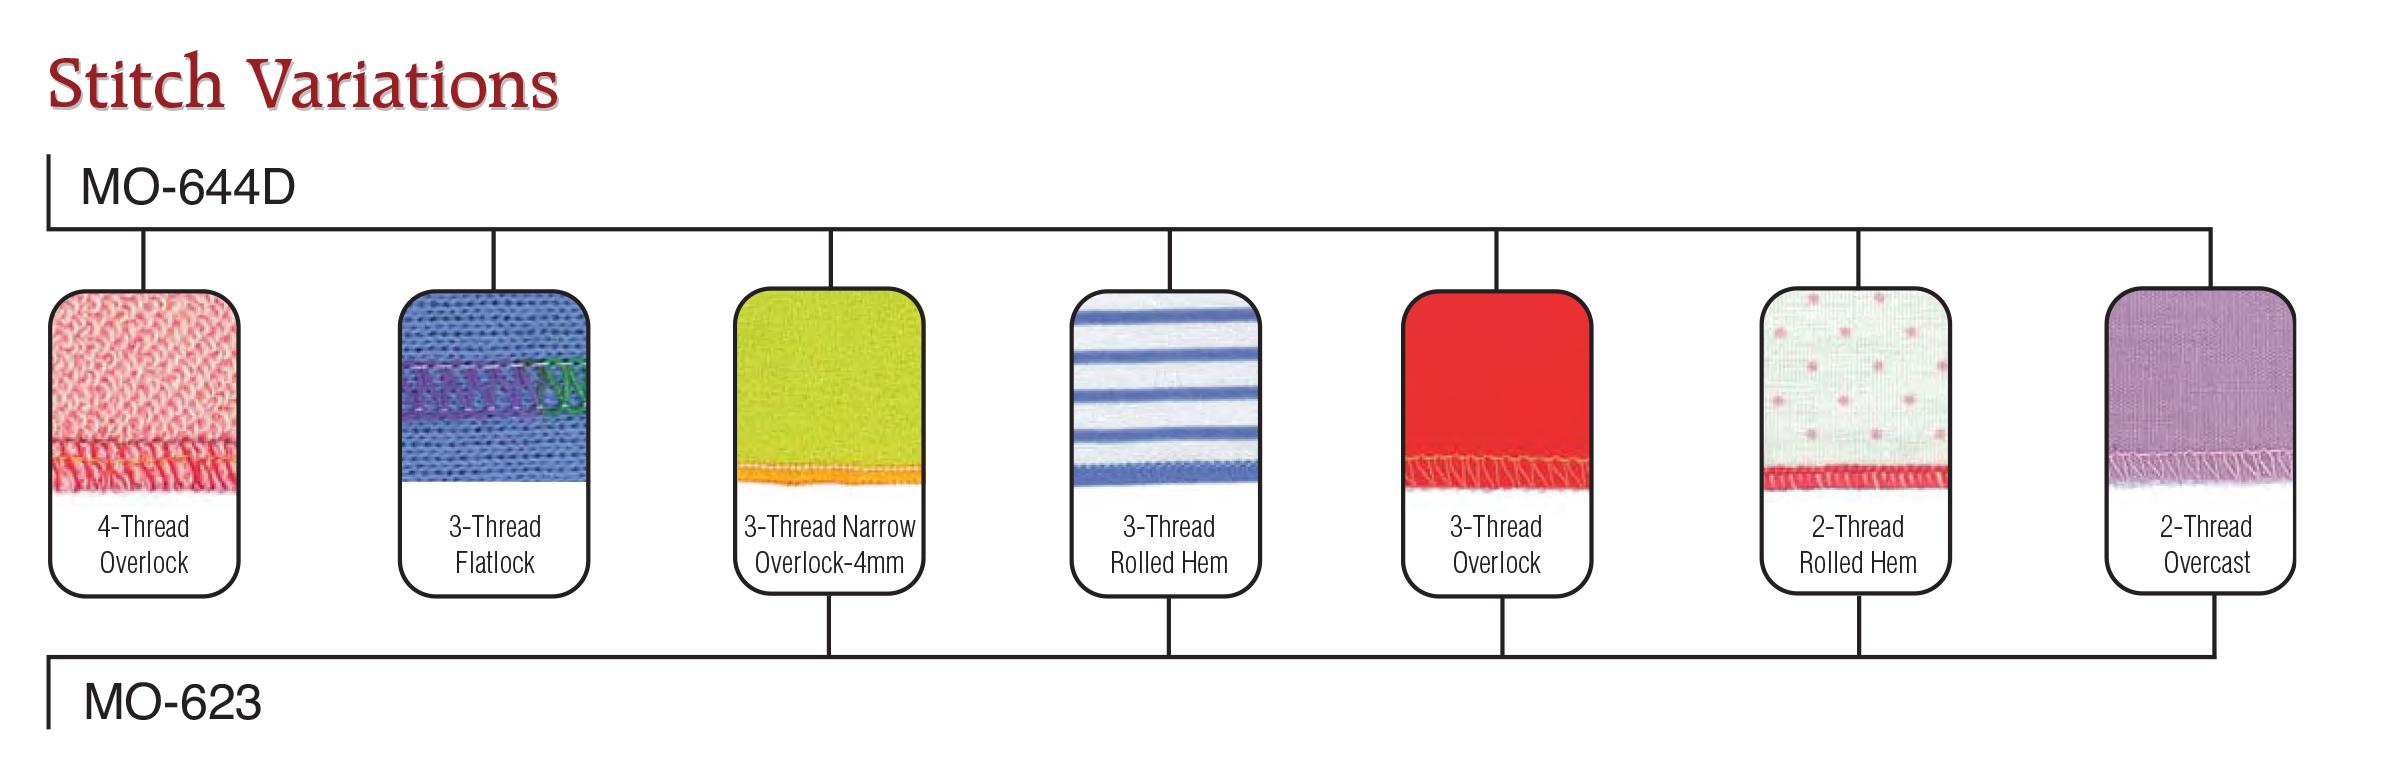 644d-stitch-variations.jpg